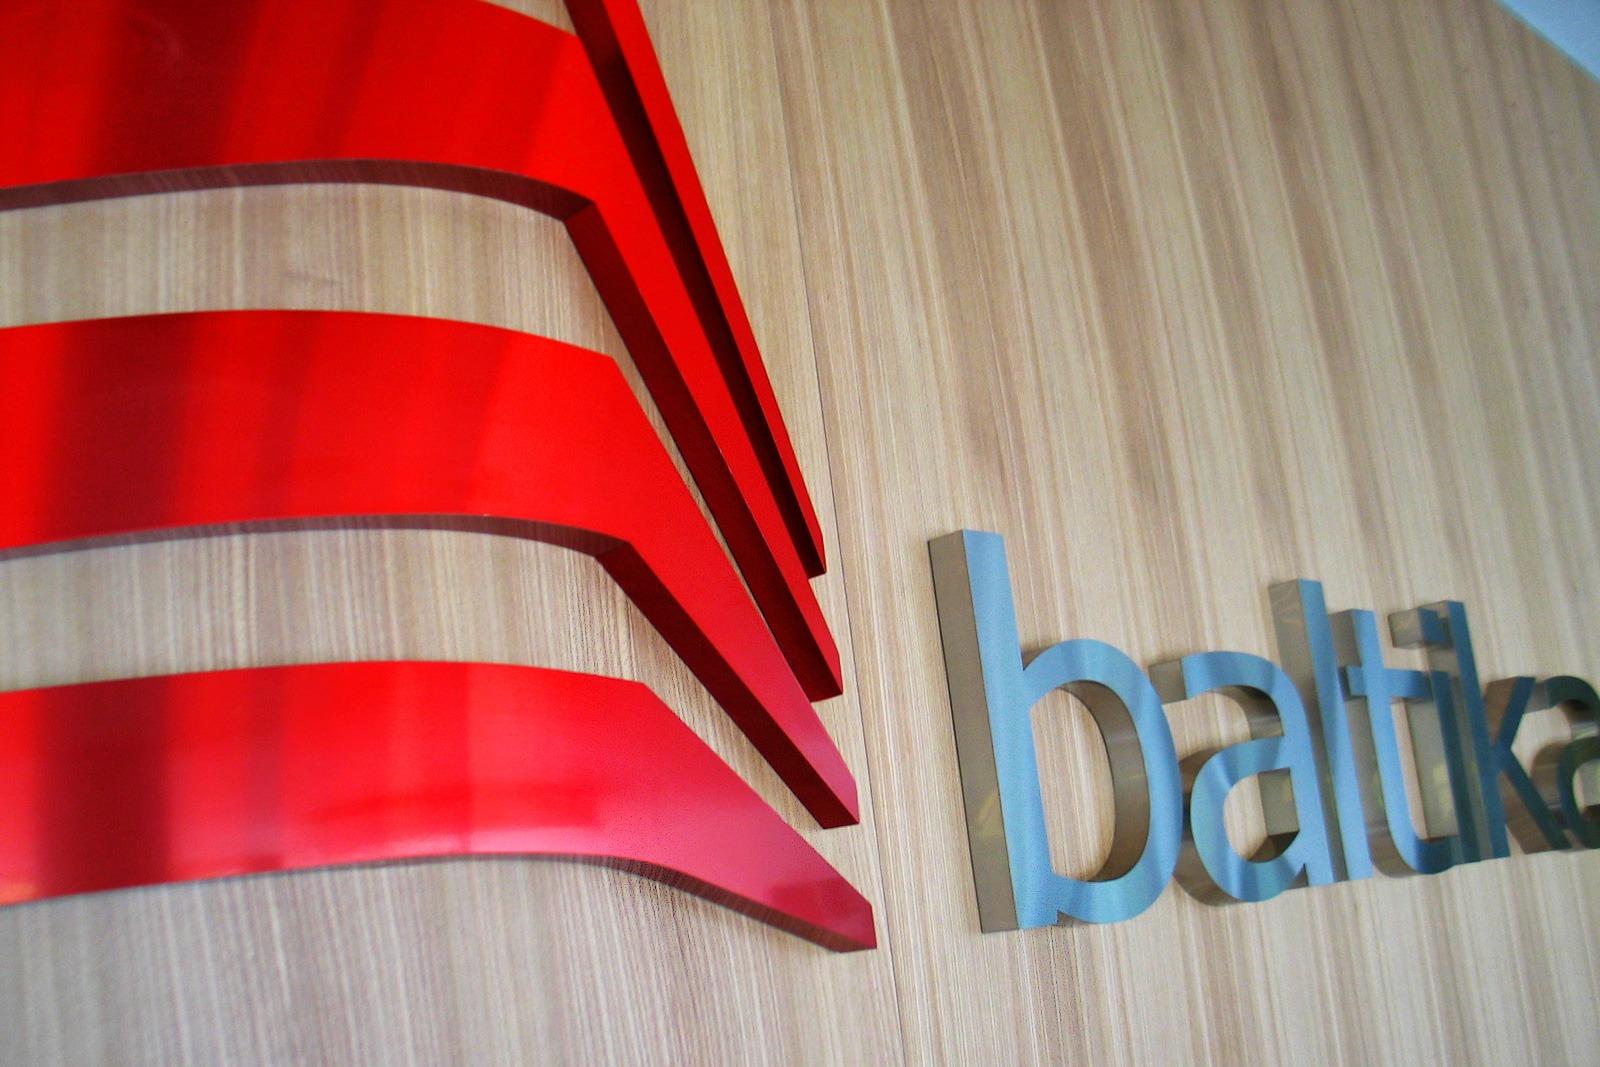 рисепшн, брендинг, бизнес-центр, балтика, reception, branding, business center, baltic